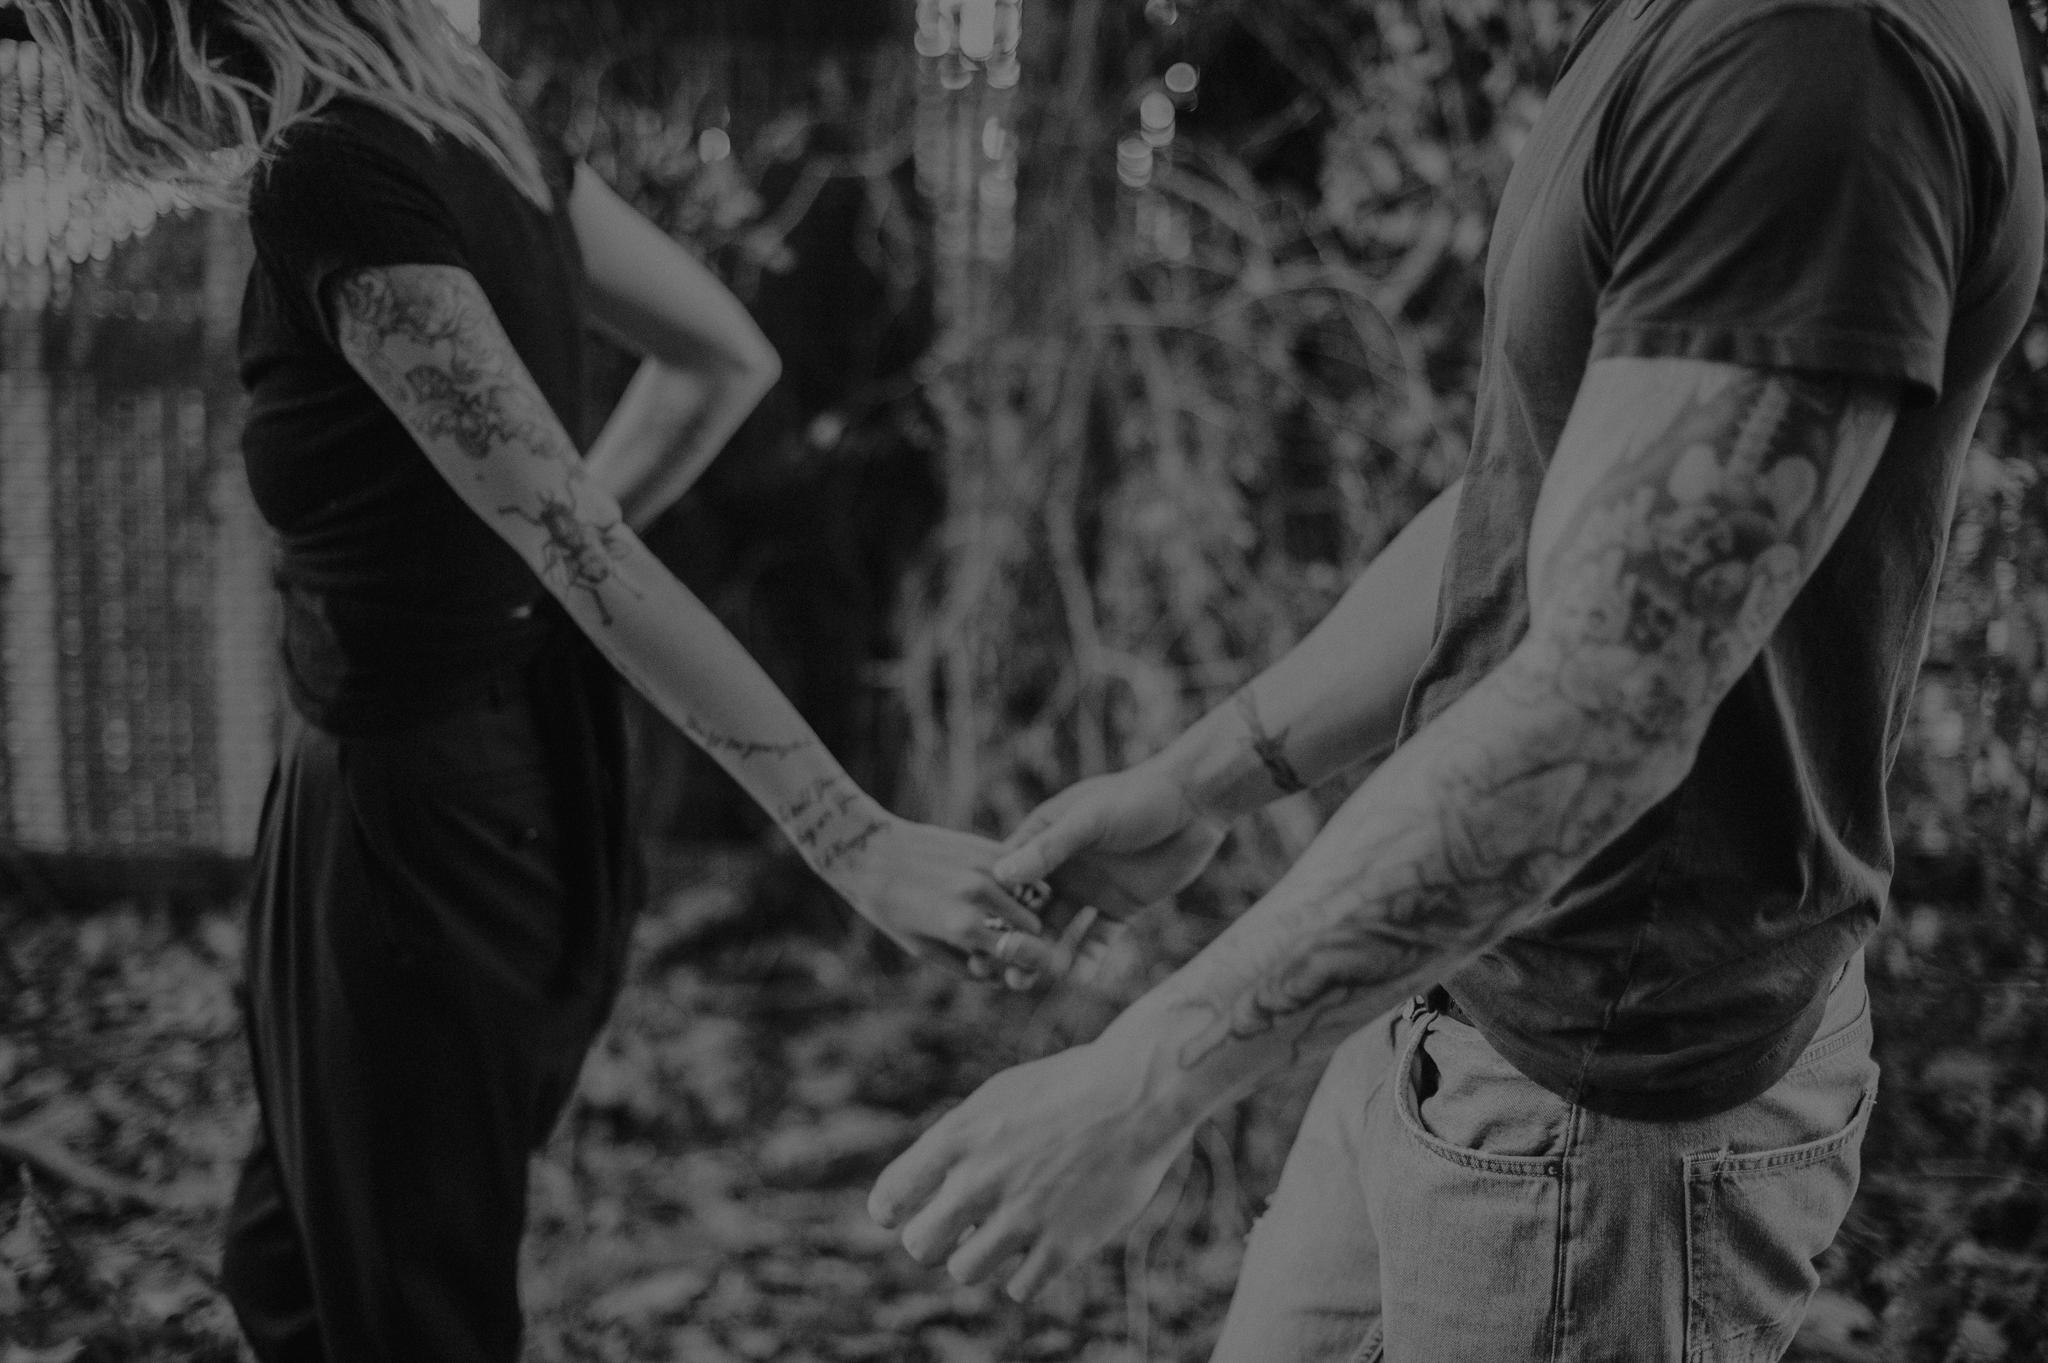 Tattooed couple holding hands walking outside